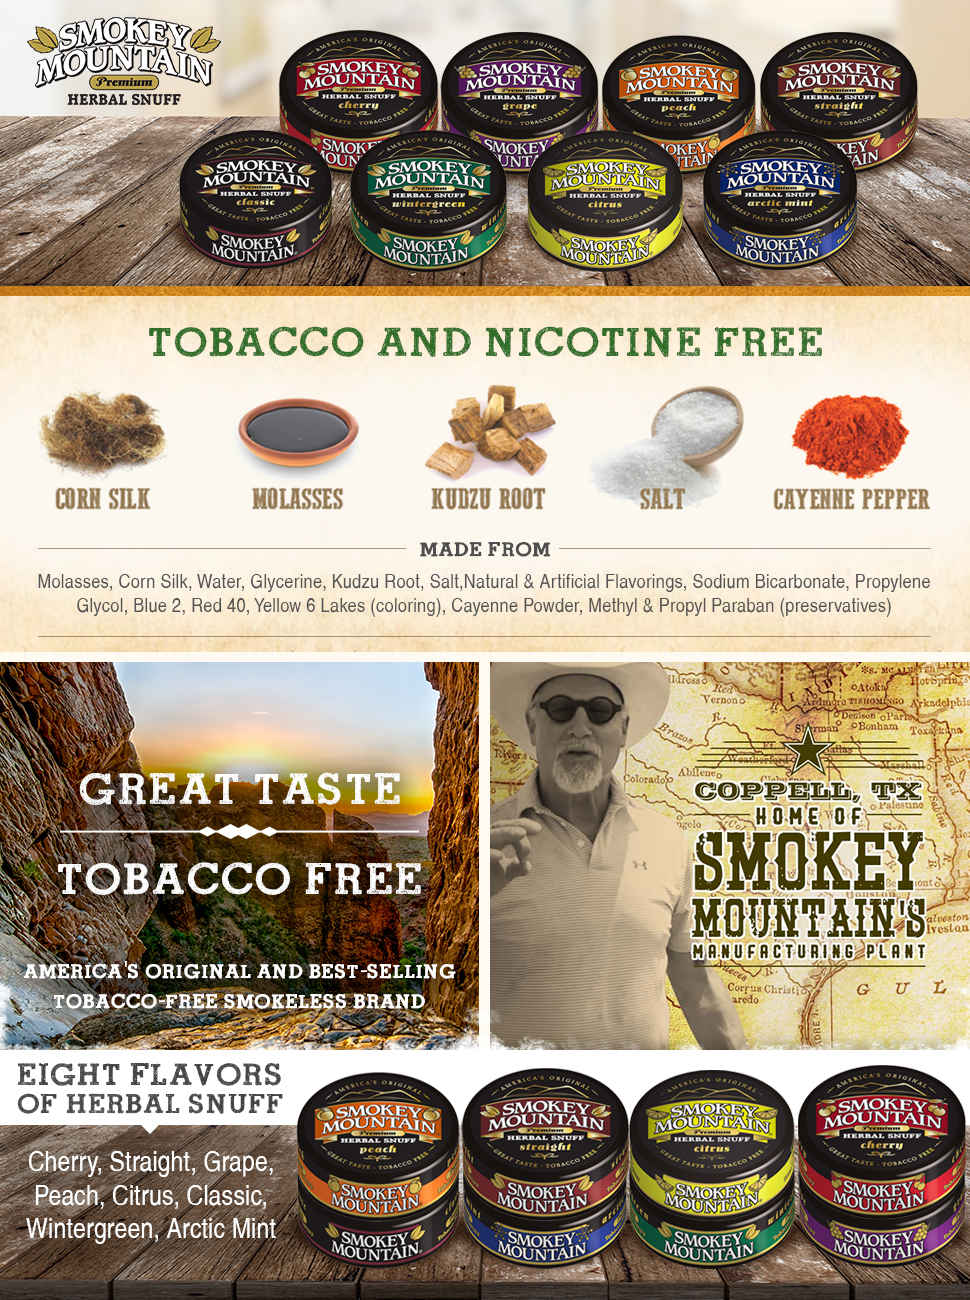 Smokey Mountain Herbal Snuff - Arctic Mint - 10-Can Box - Nicotine-Free and  Tobacco-Free - Herbal